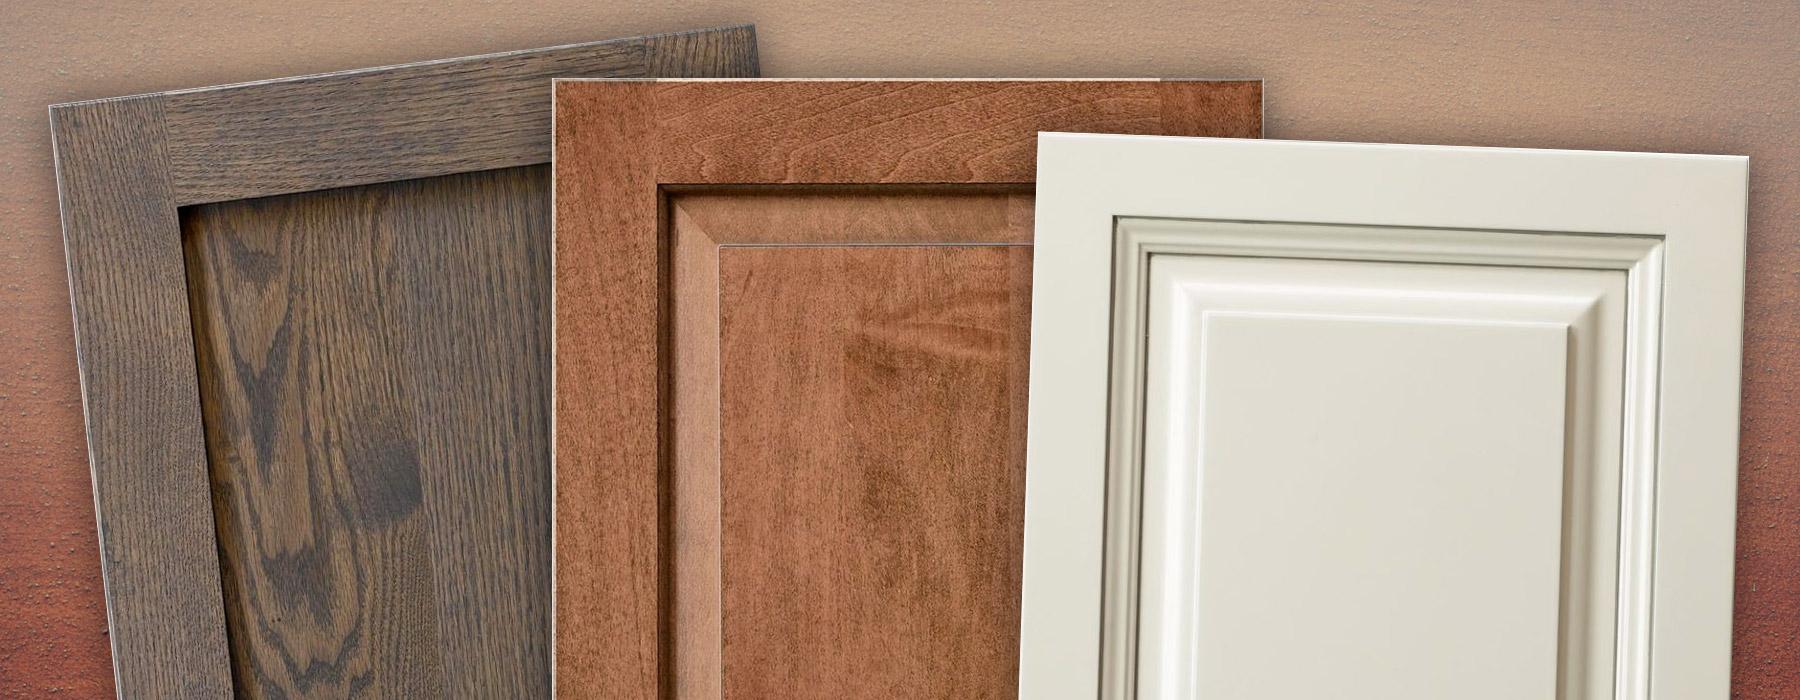 Kitchen Cabinets Doors Sale